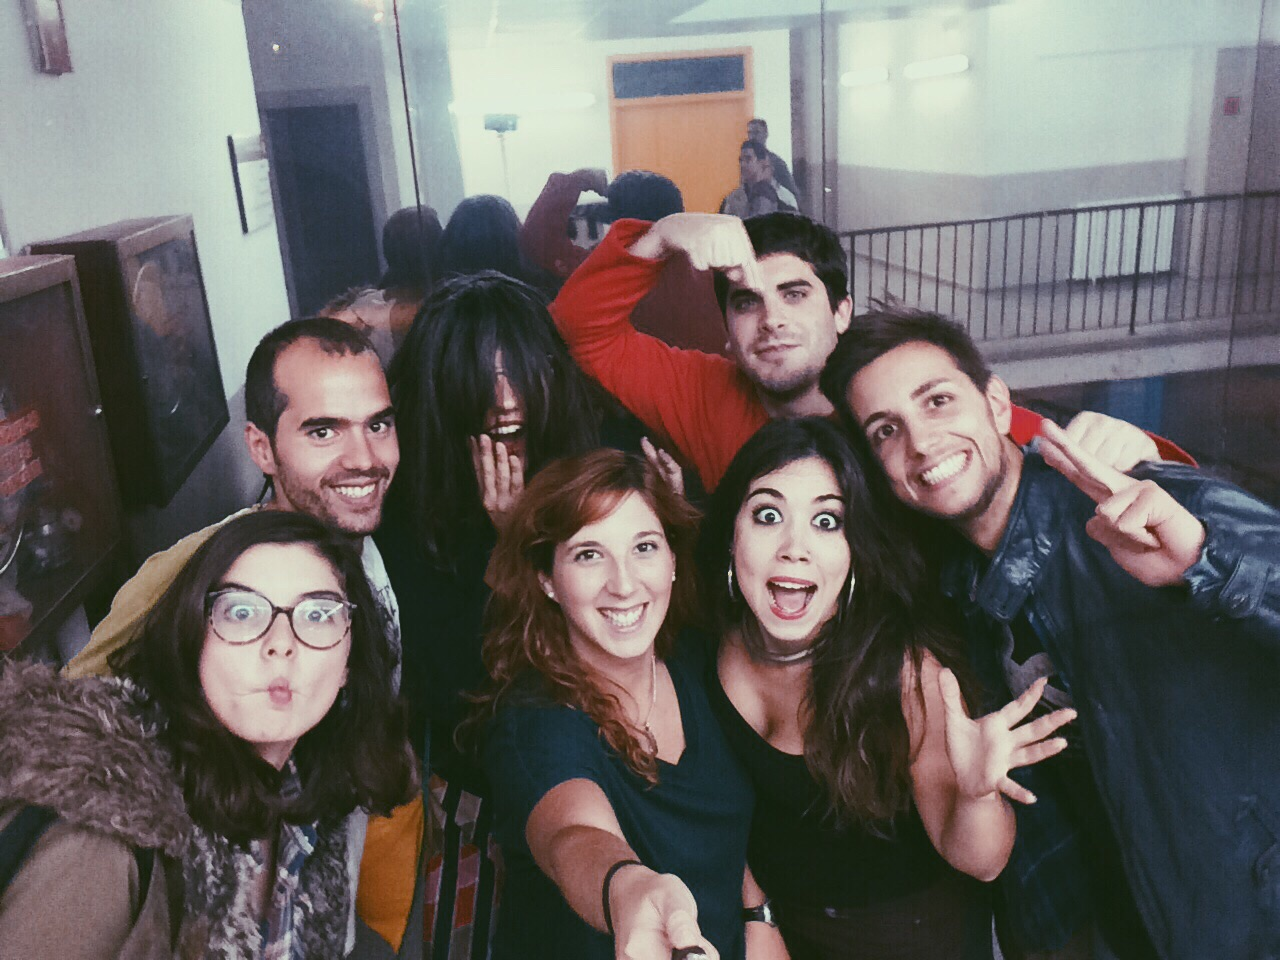 Angela Sánchez, jordi Roca, Senyoreta X, Silvia Depares, Araitz Pippers, Gabriel Coromines i Hector Nistal